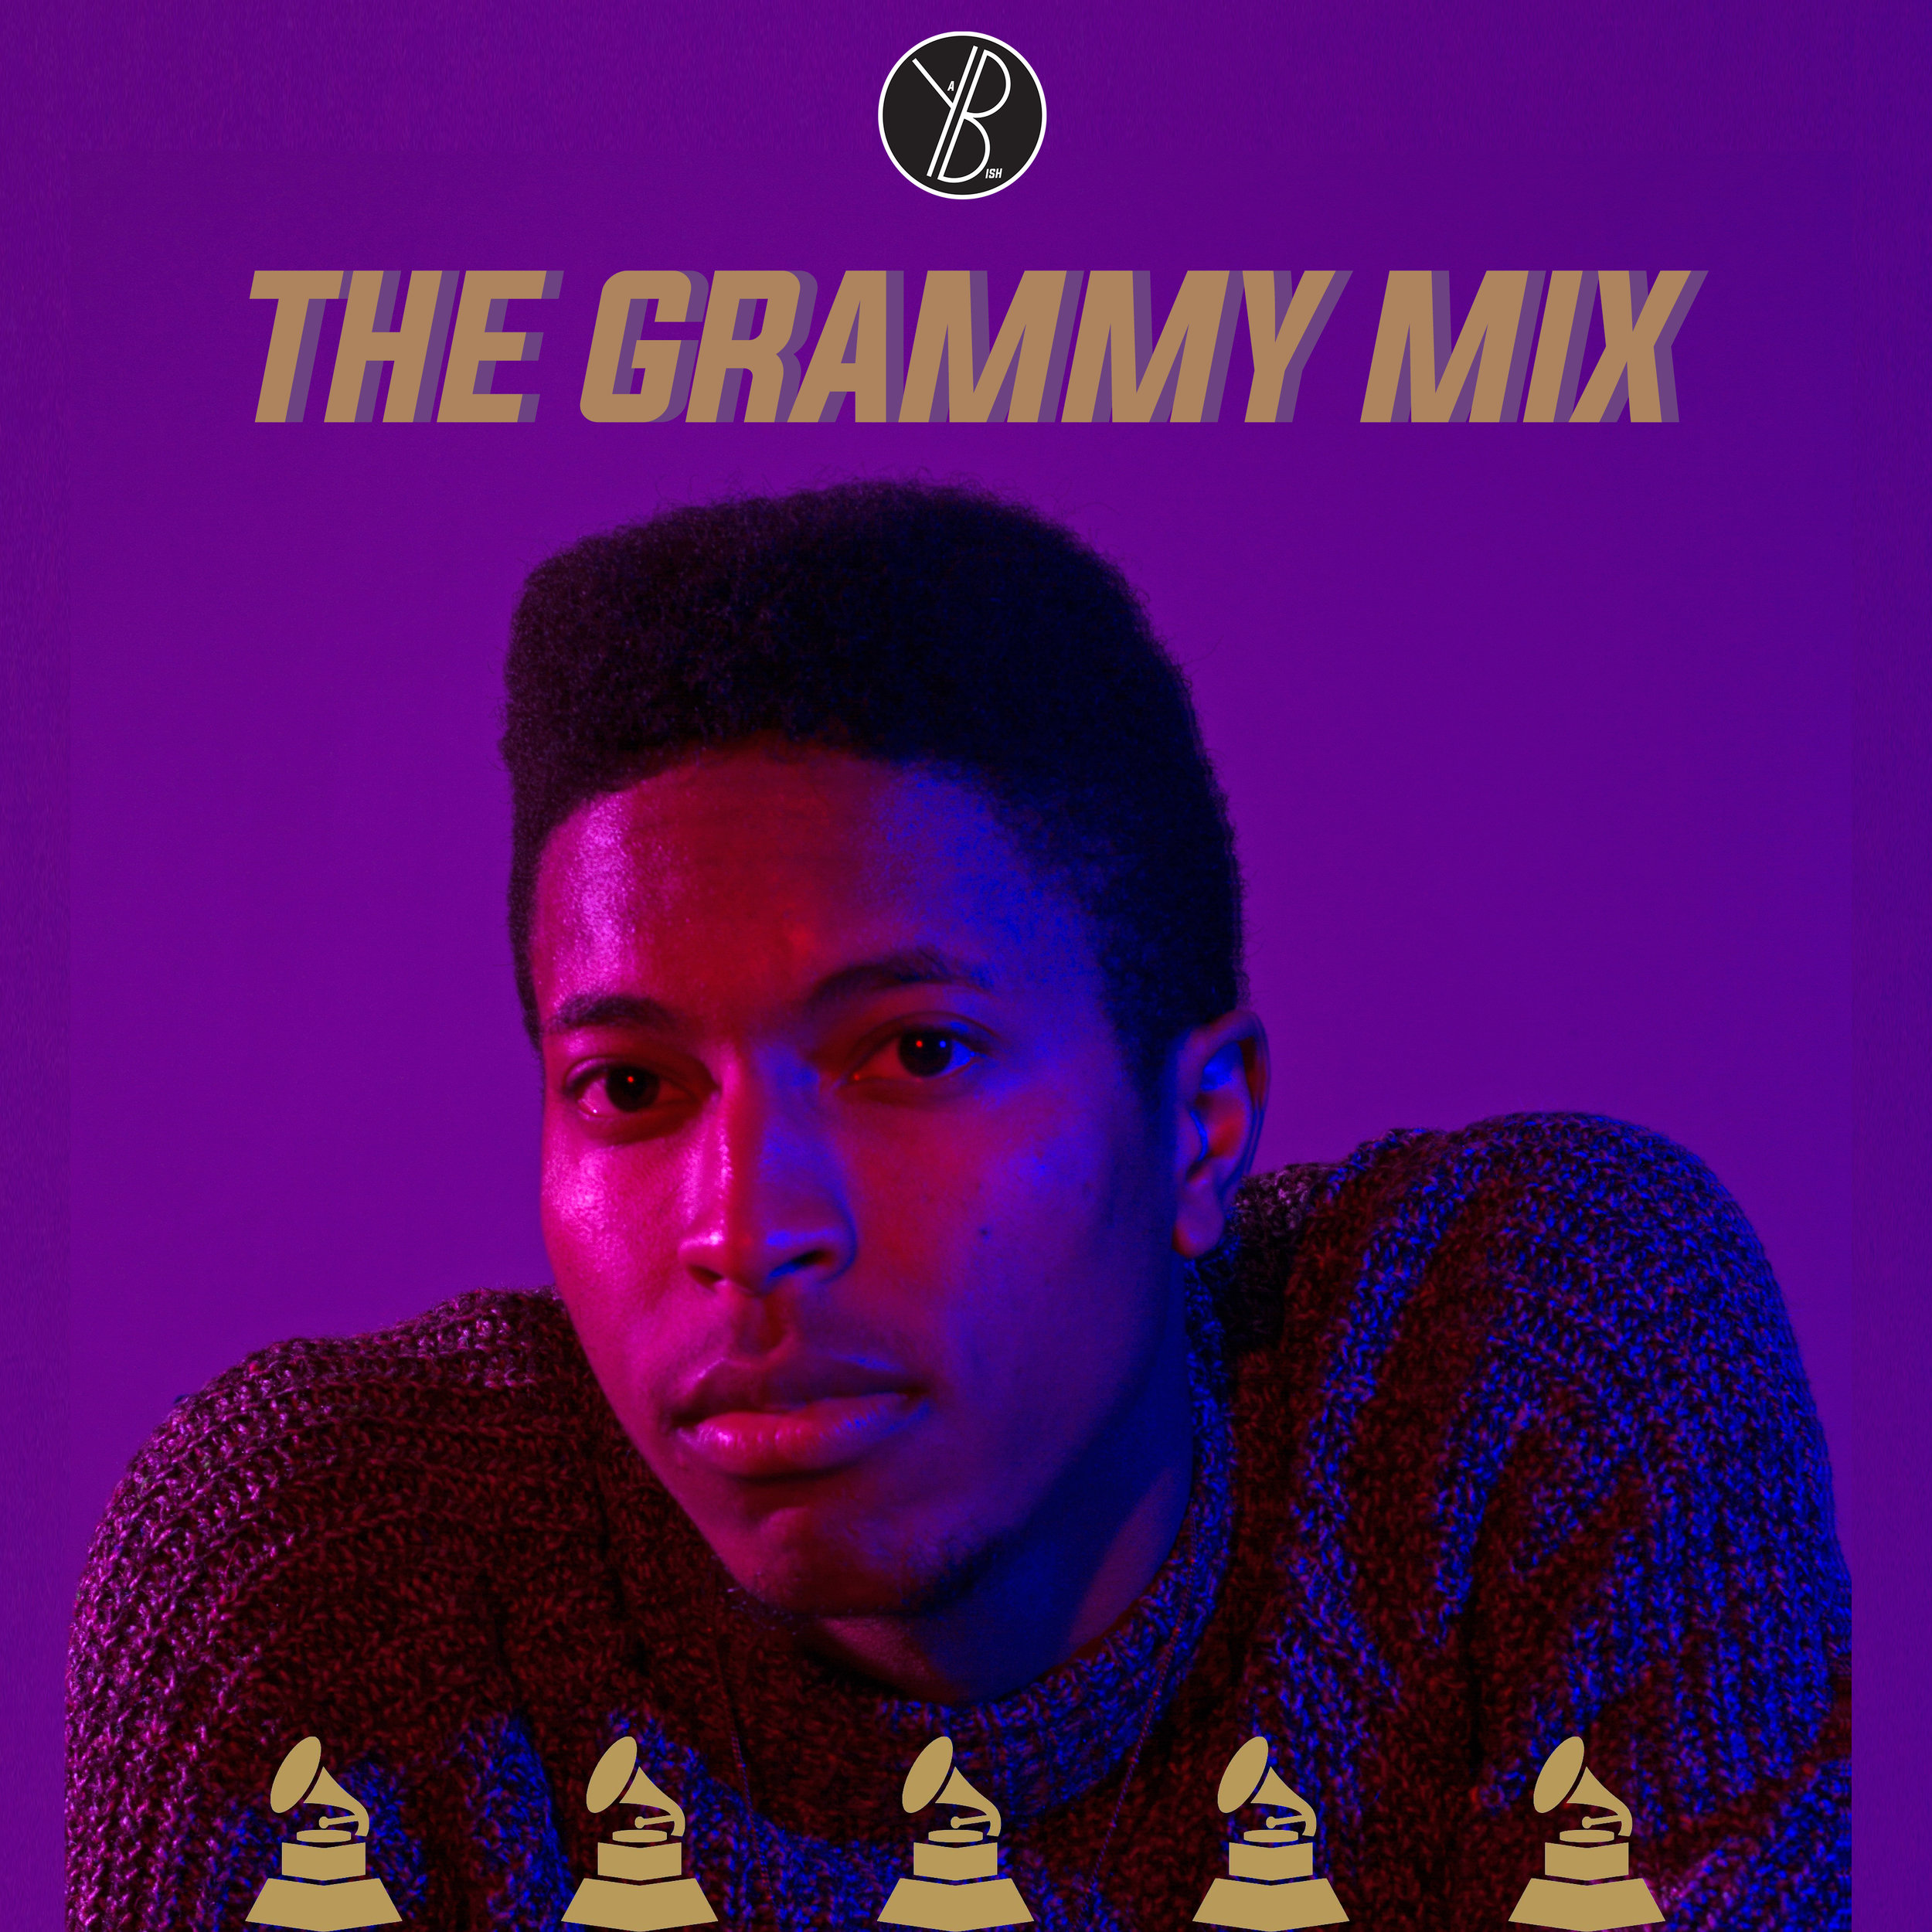 GrammyMixAlbumArt.jpg